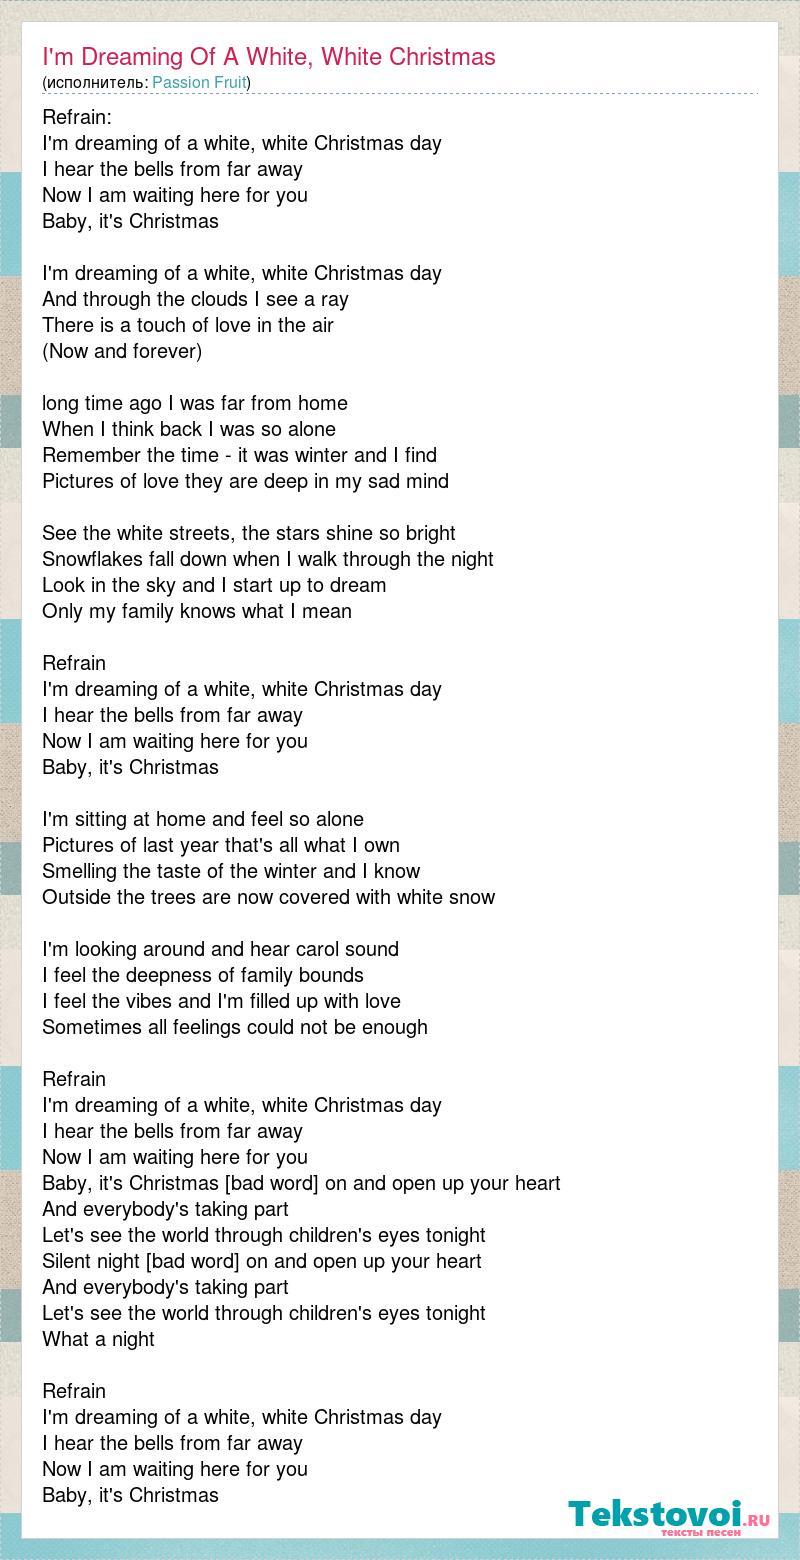 Passion Fruit: I\'m Dreaming Of A White, White Christmas слова песни